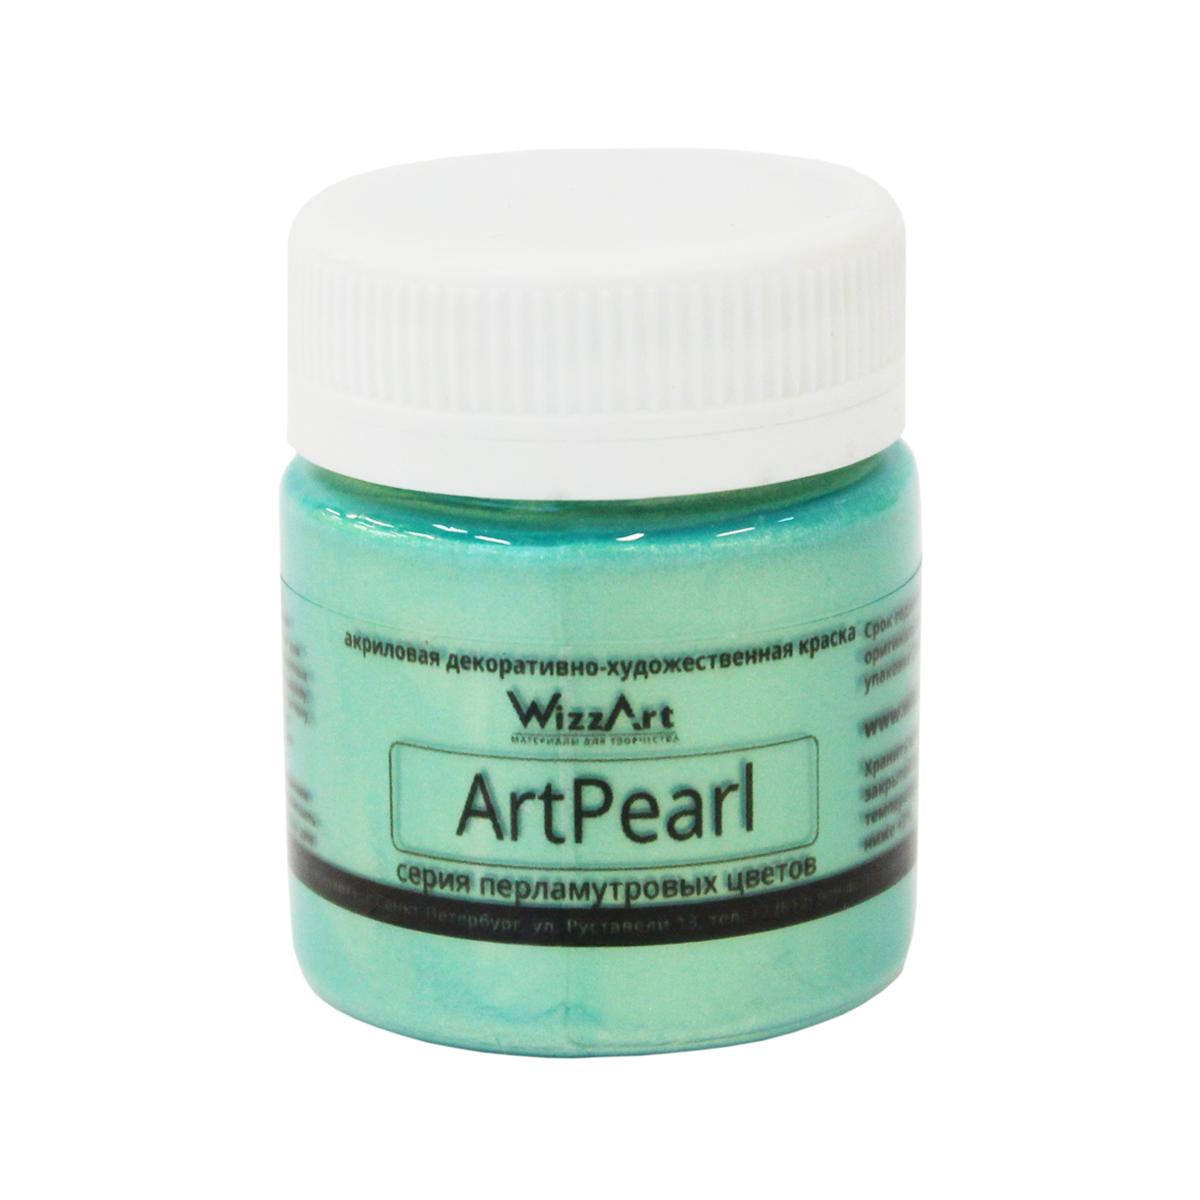 Краска акриловая Wizzart ArtPearl. Хамелеон, цвет: зеленый, 40 мл501058